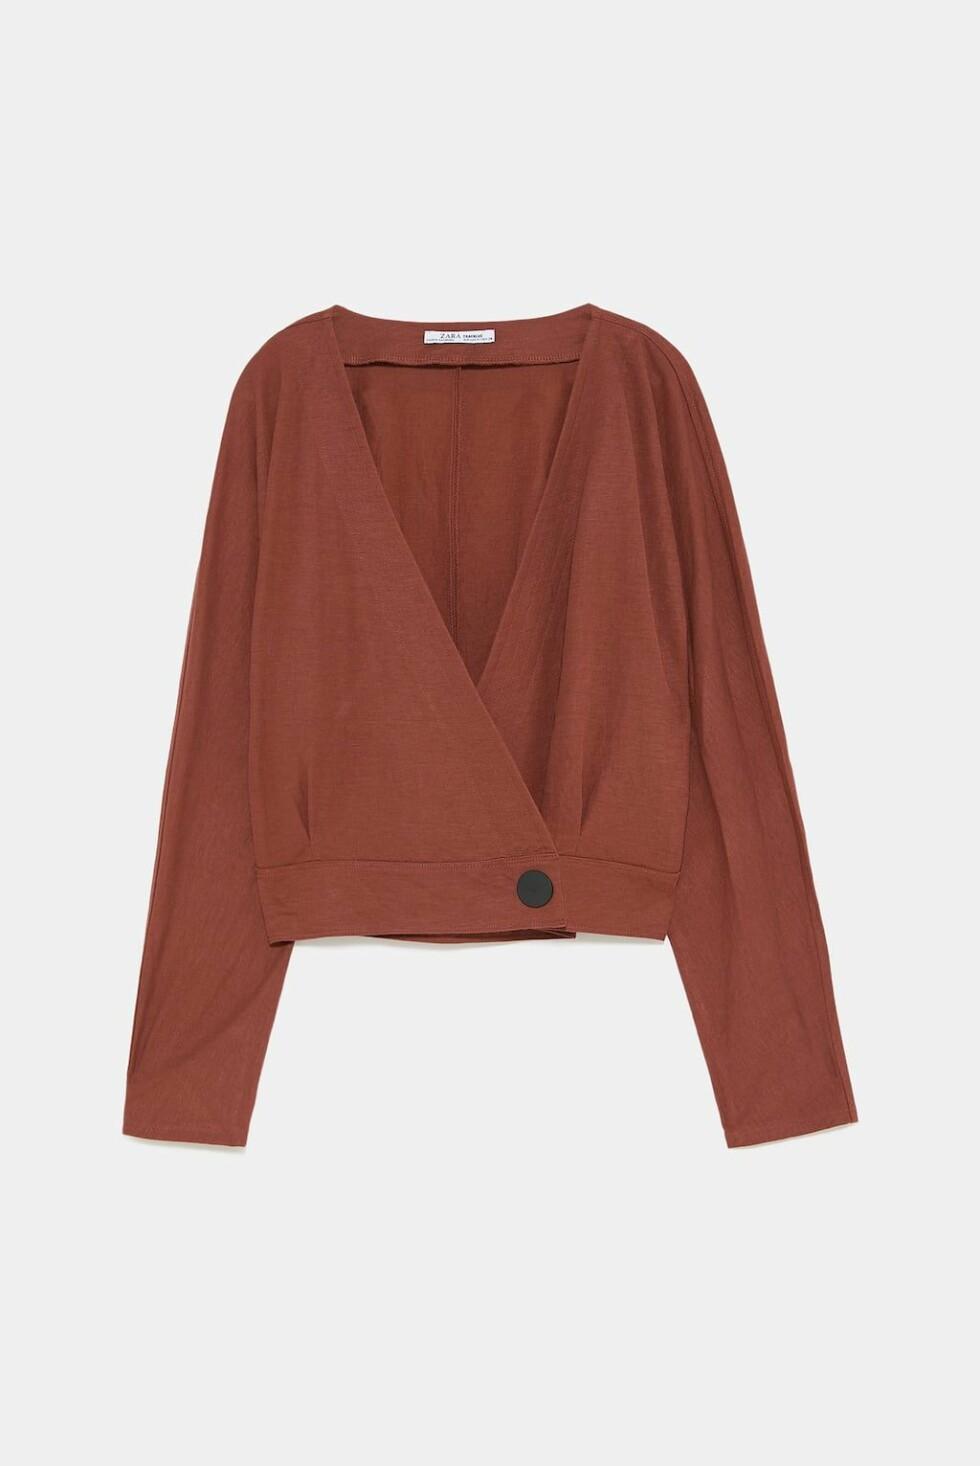 <strong>Topp fra Zara  230,-  https:</strong>//www.zara.com/no/no/topp-med-omslag-med-knapp-p05580302.html?v1=6621647&v2=1074755